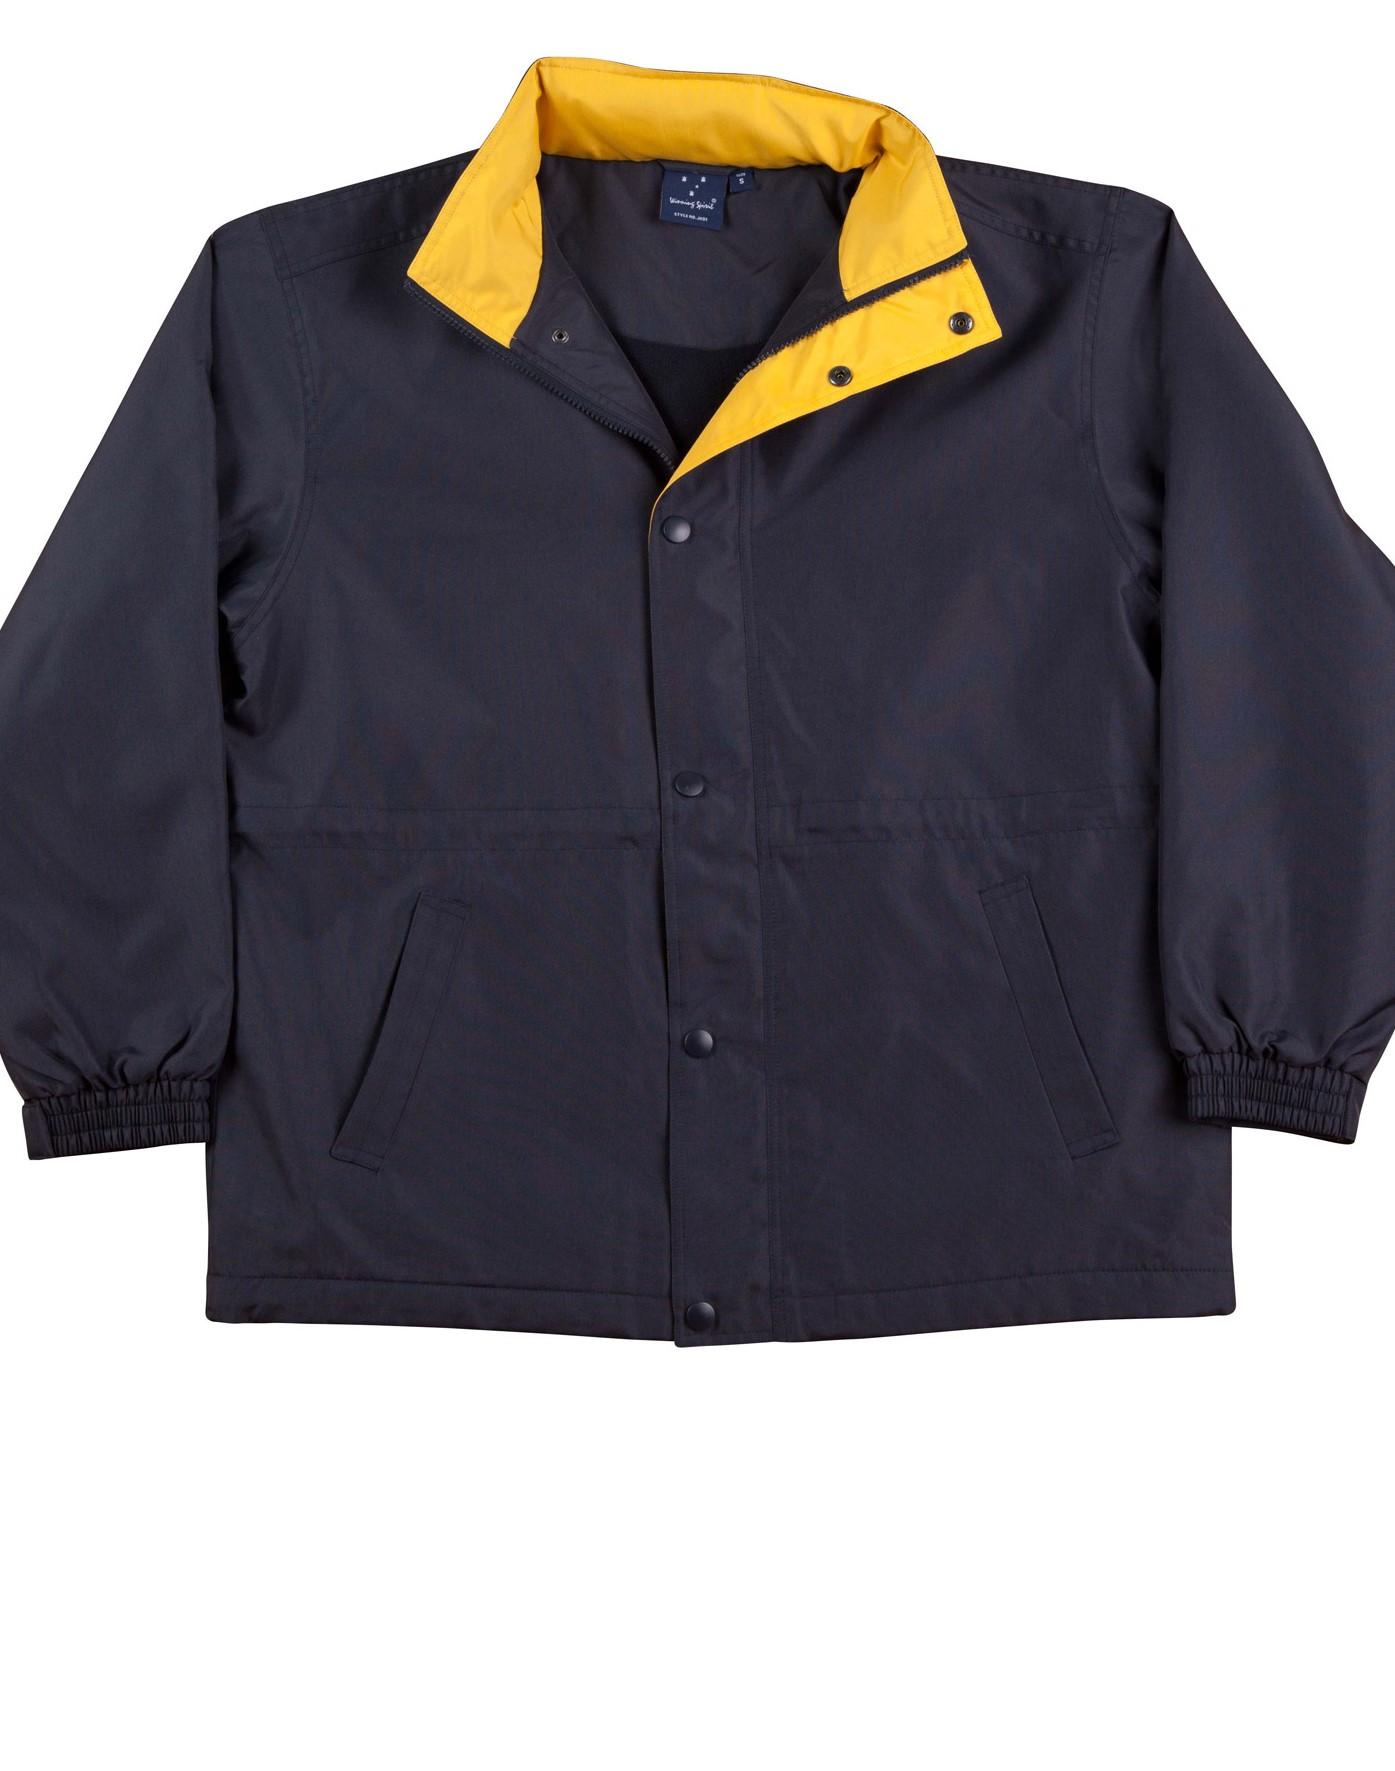 KDPC Jacket